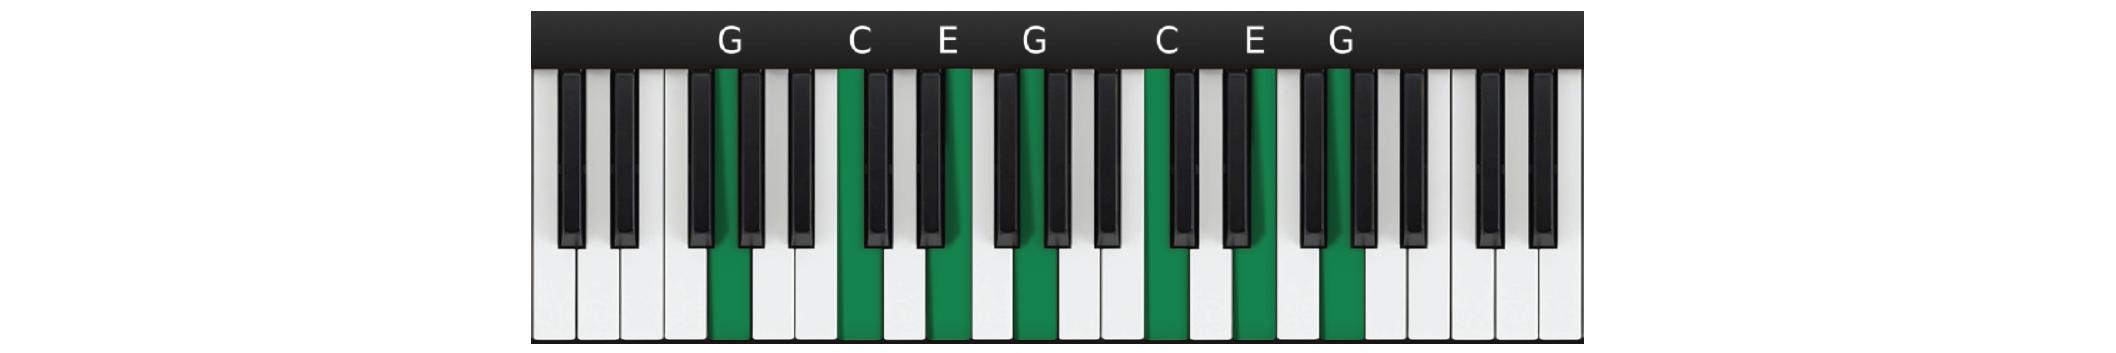 Big C Major Chord